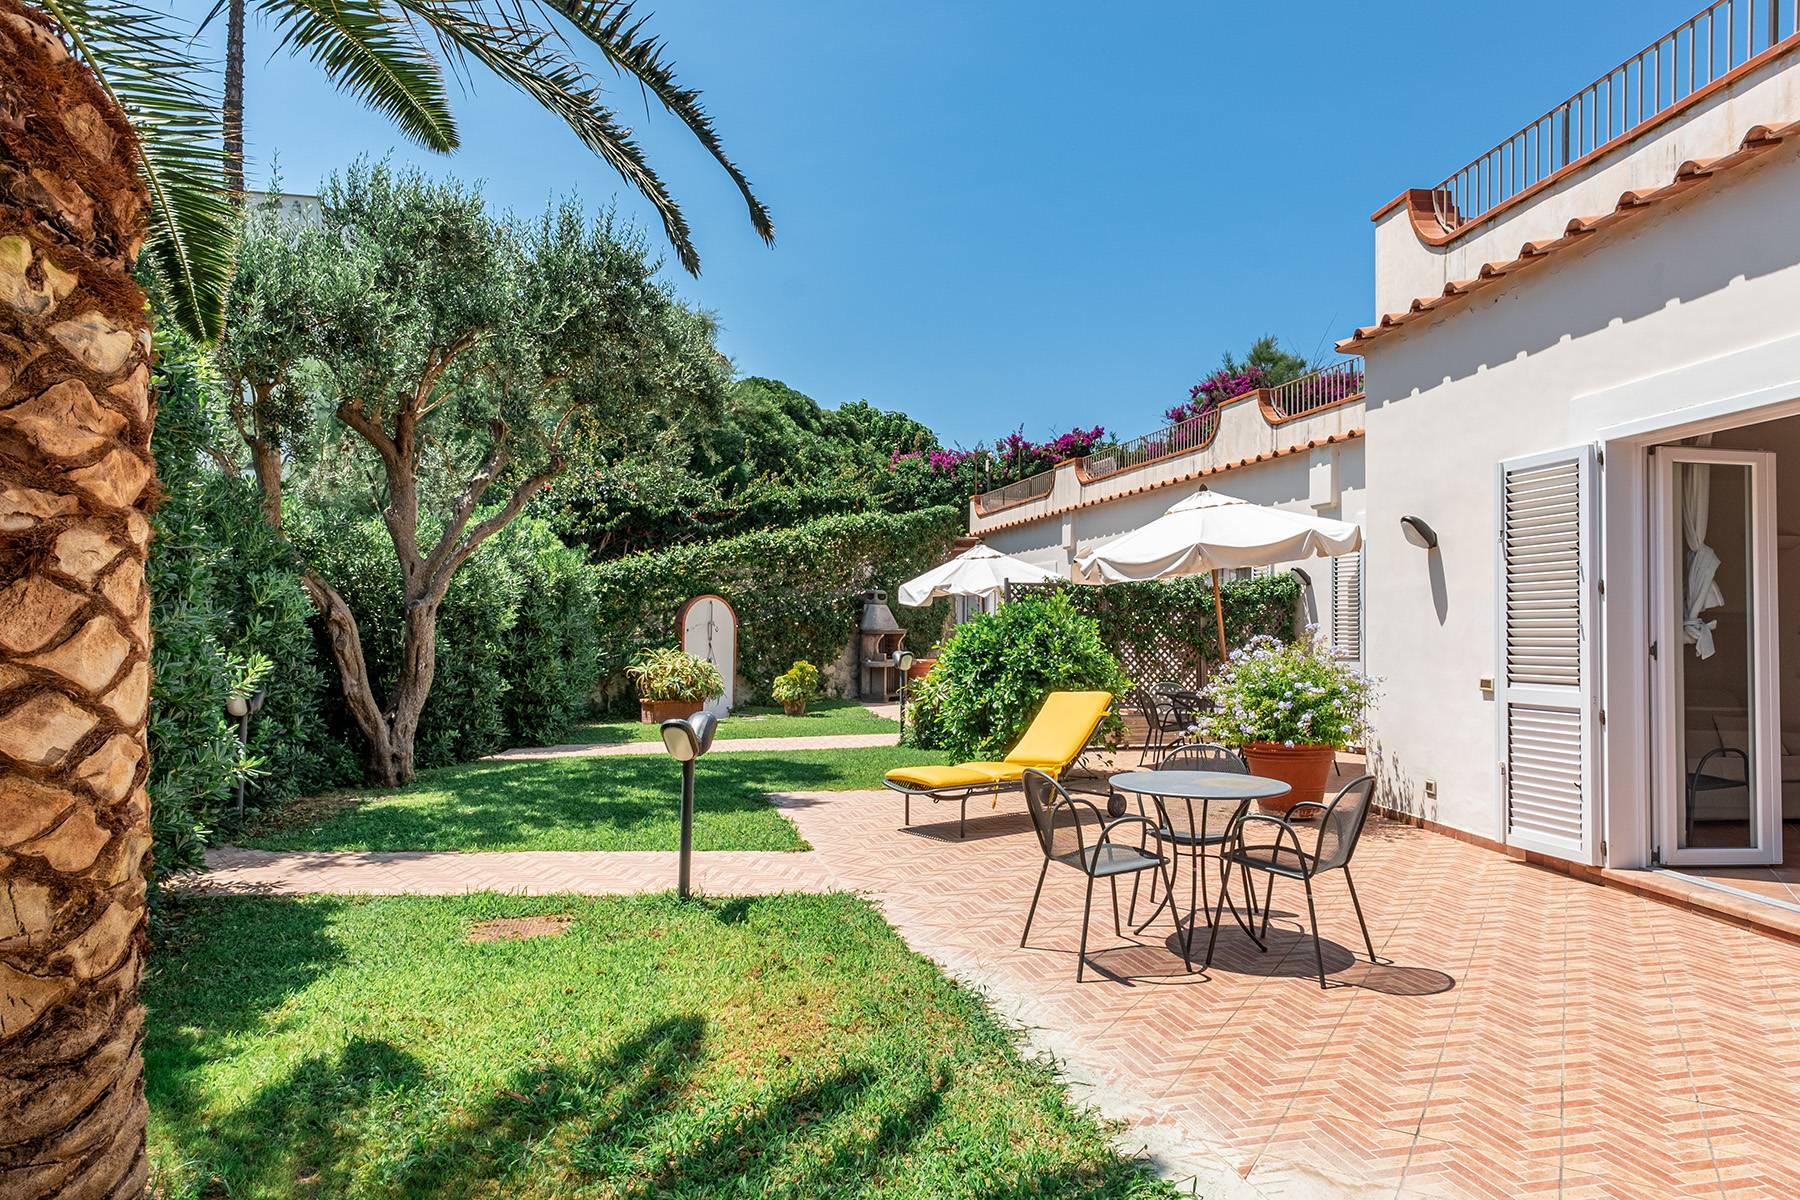 Villa in Vendita a Ischia: 5 locali, 400 mq - Foto 23